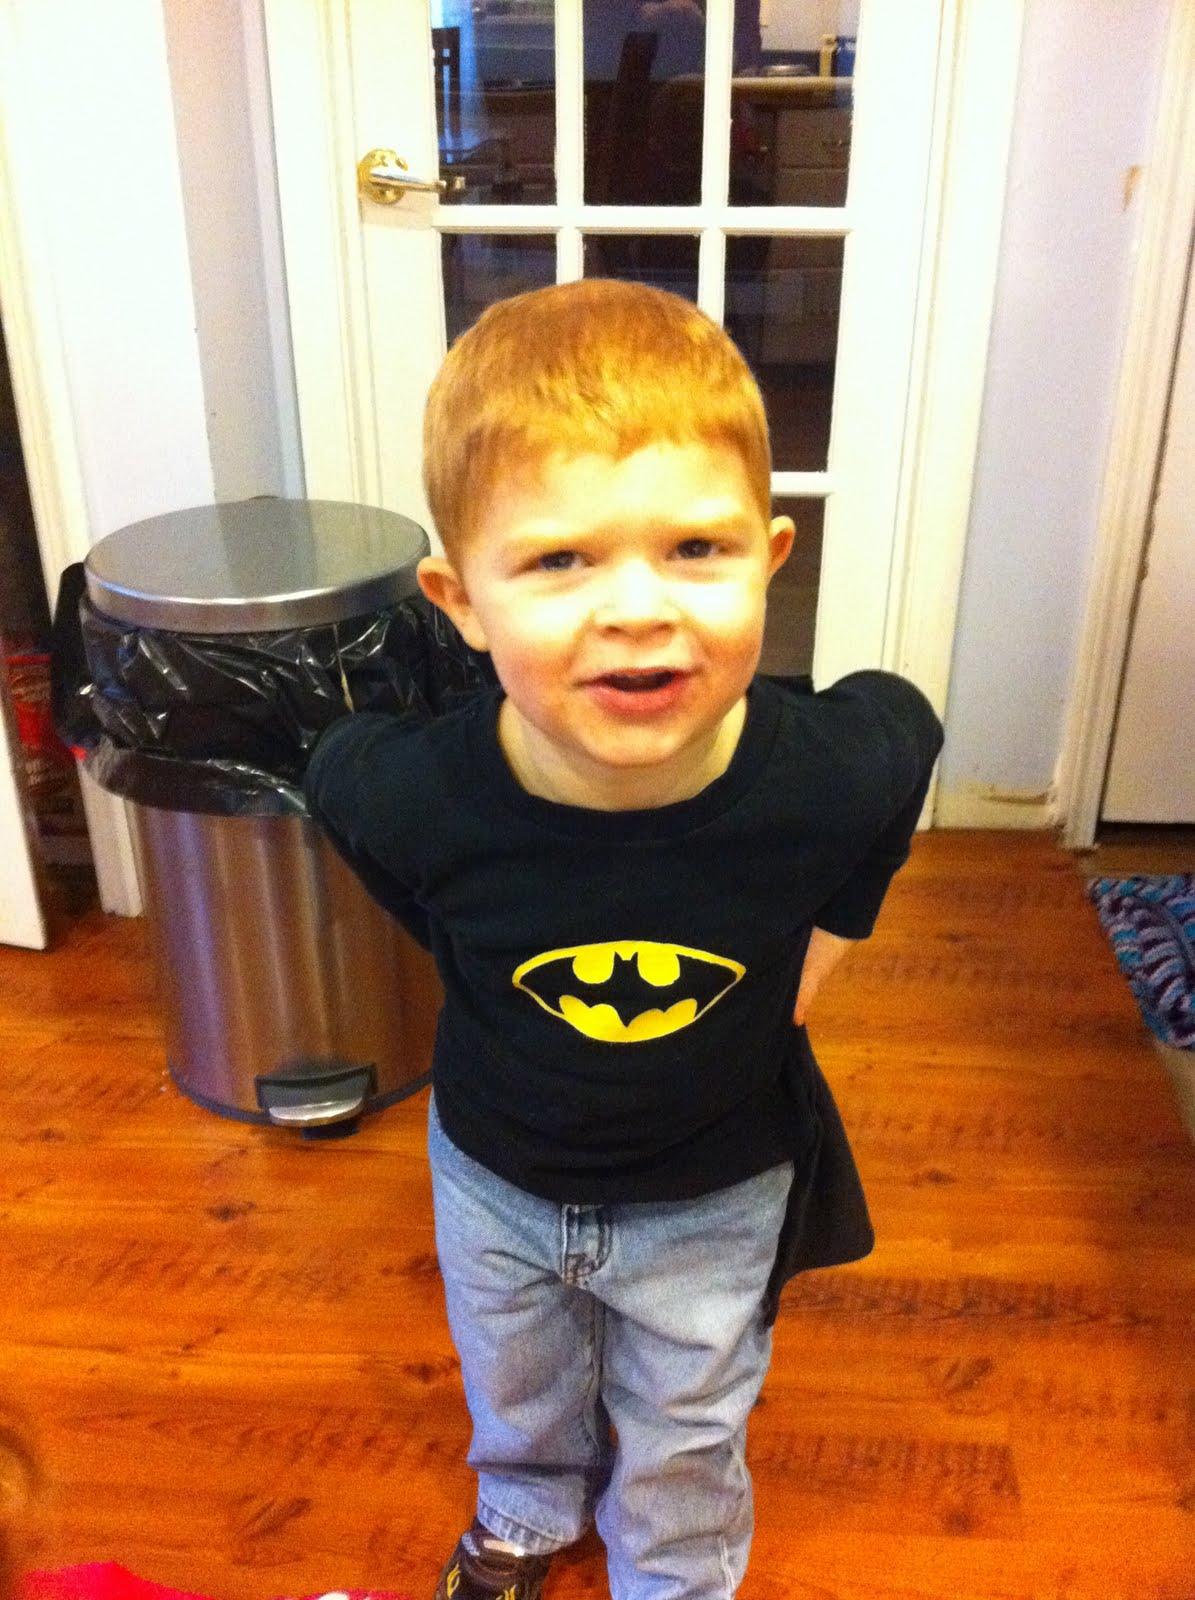 Child Bearing Hips: BatCam!